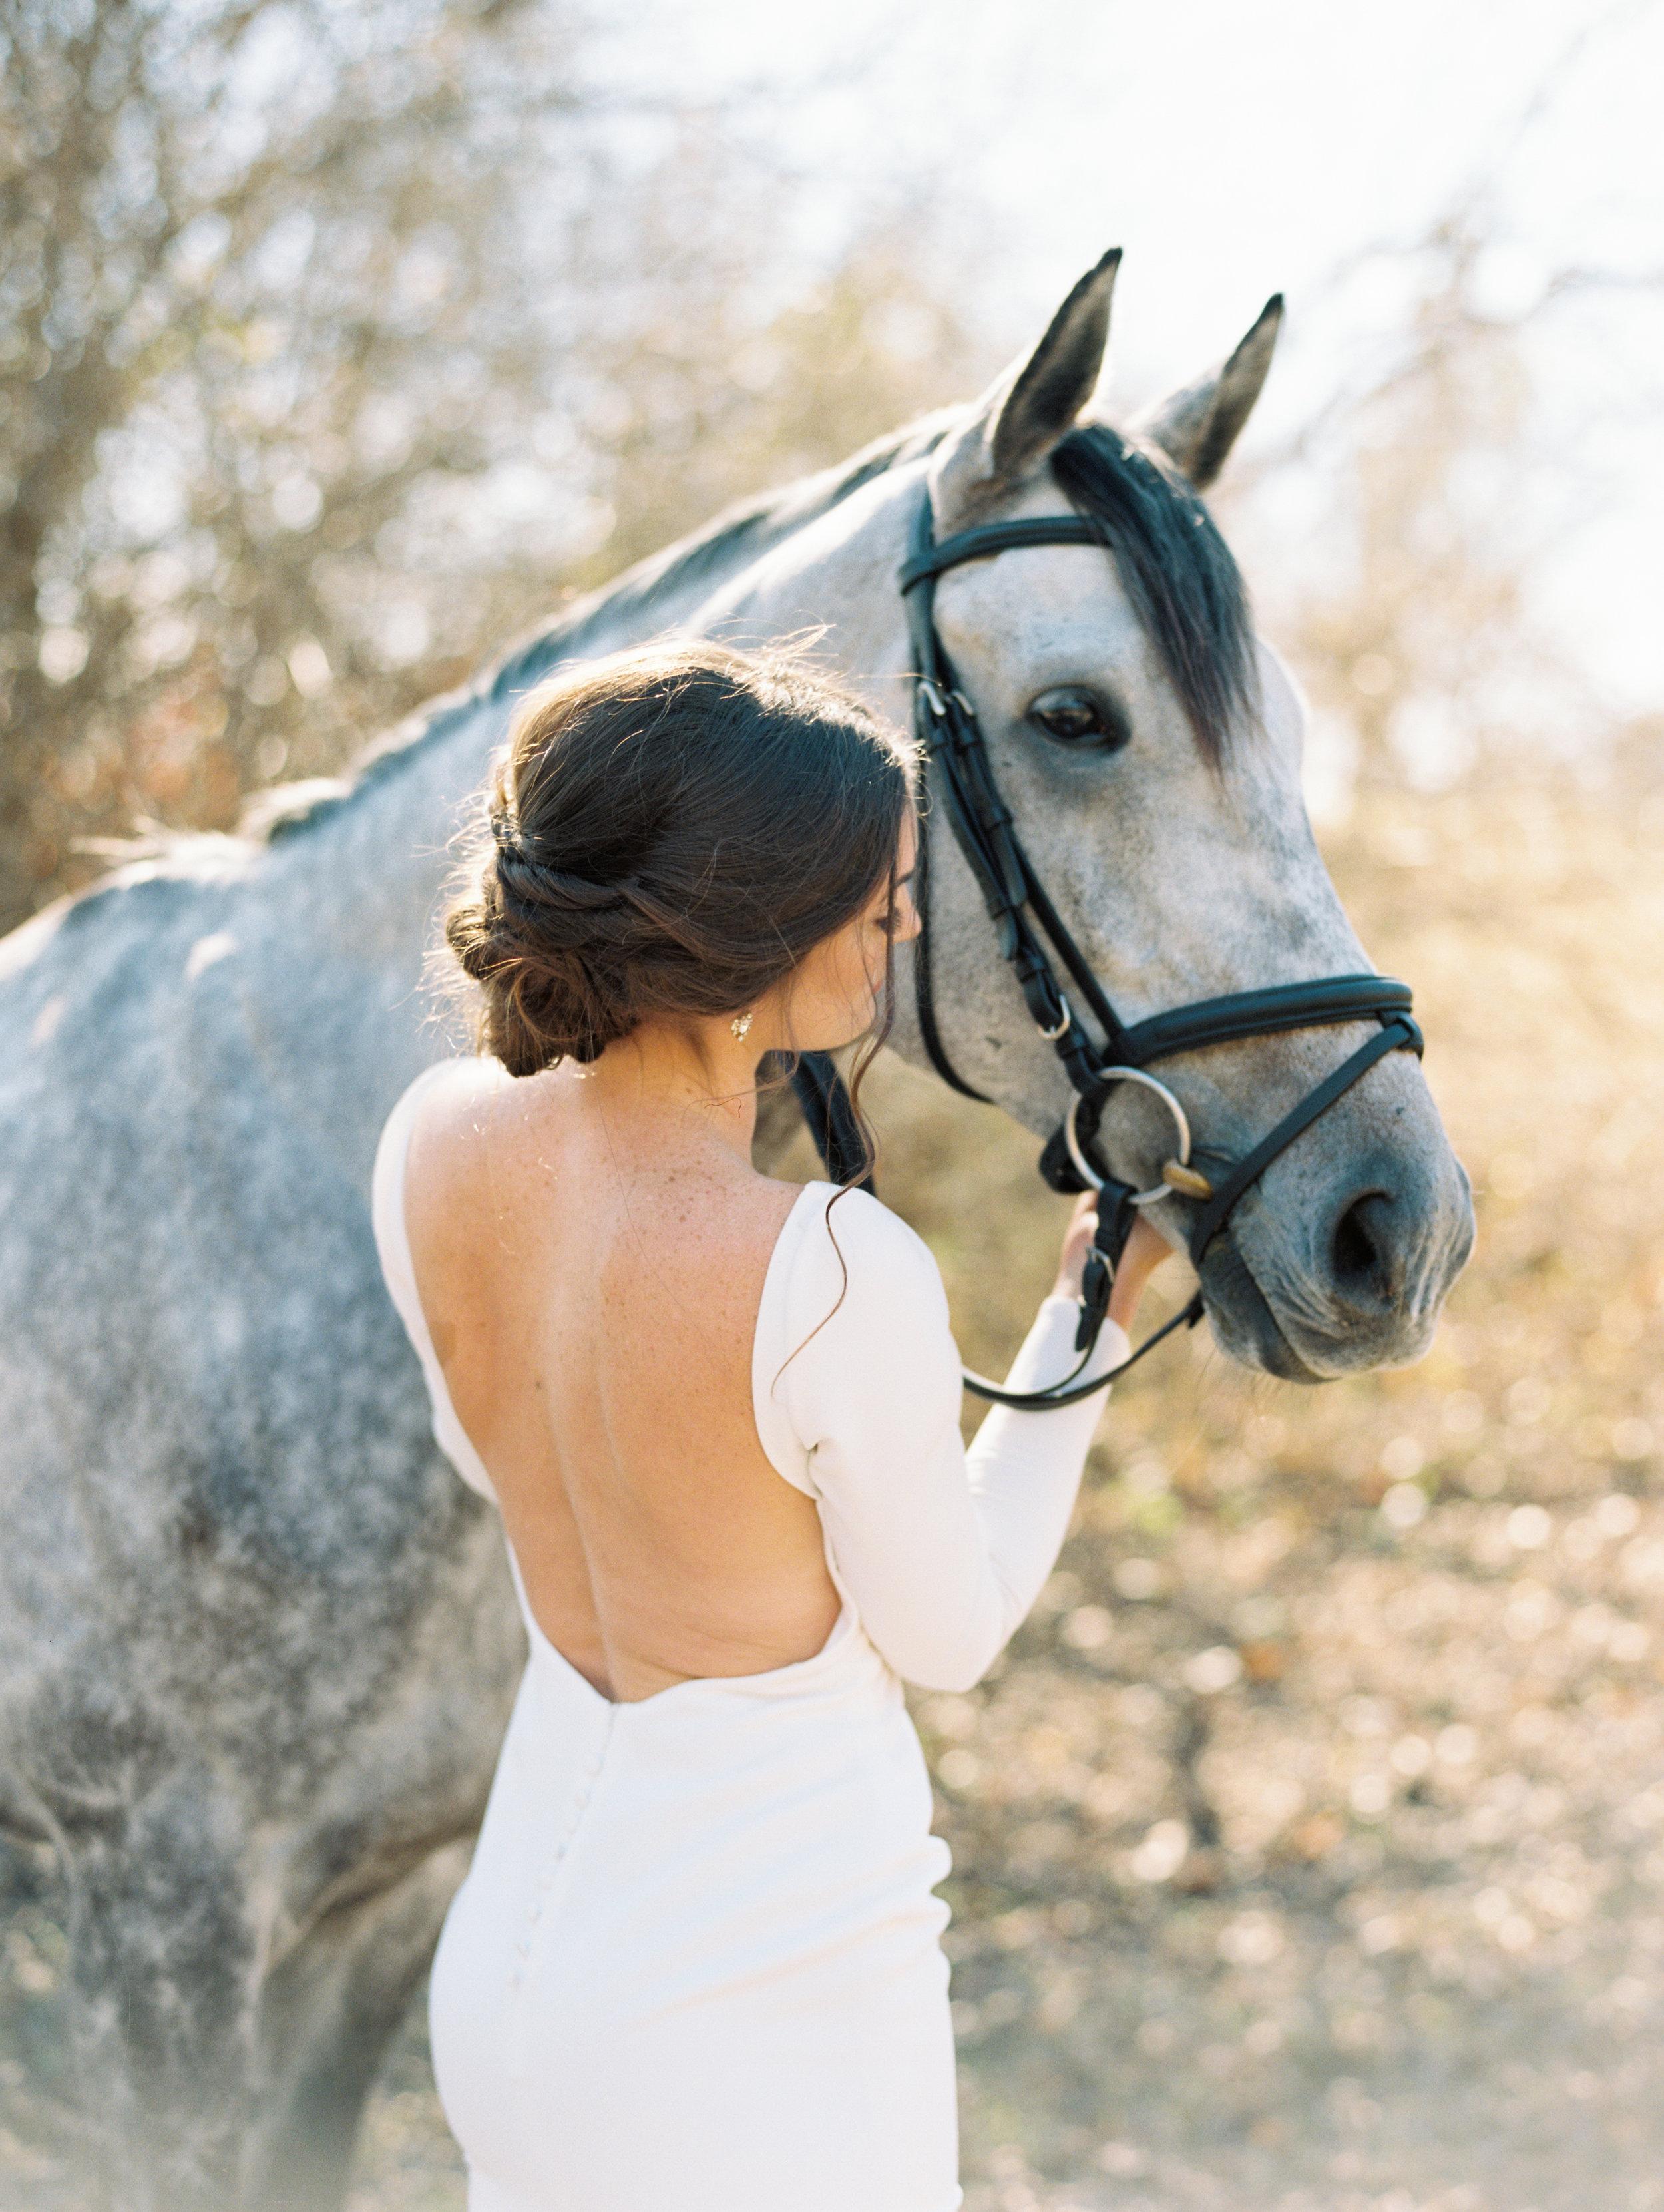 ralph-lauren-equestrian-styled-shoot-ar-photography-103.jpg